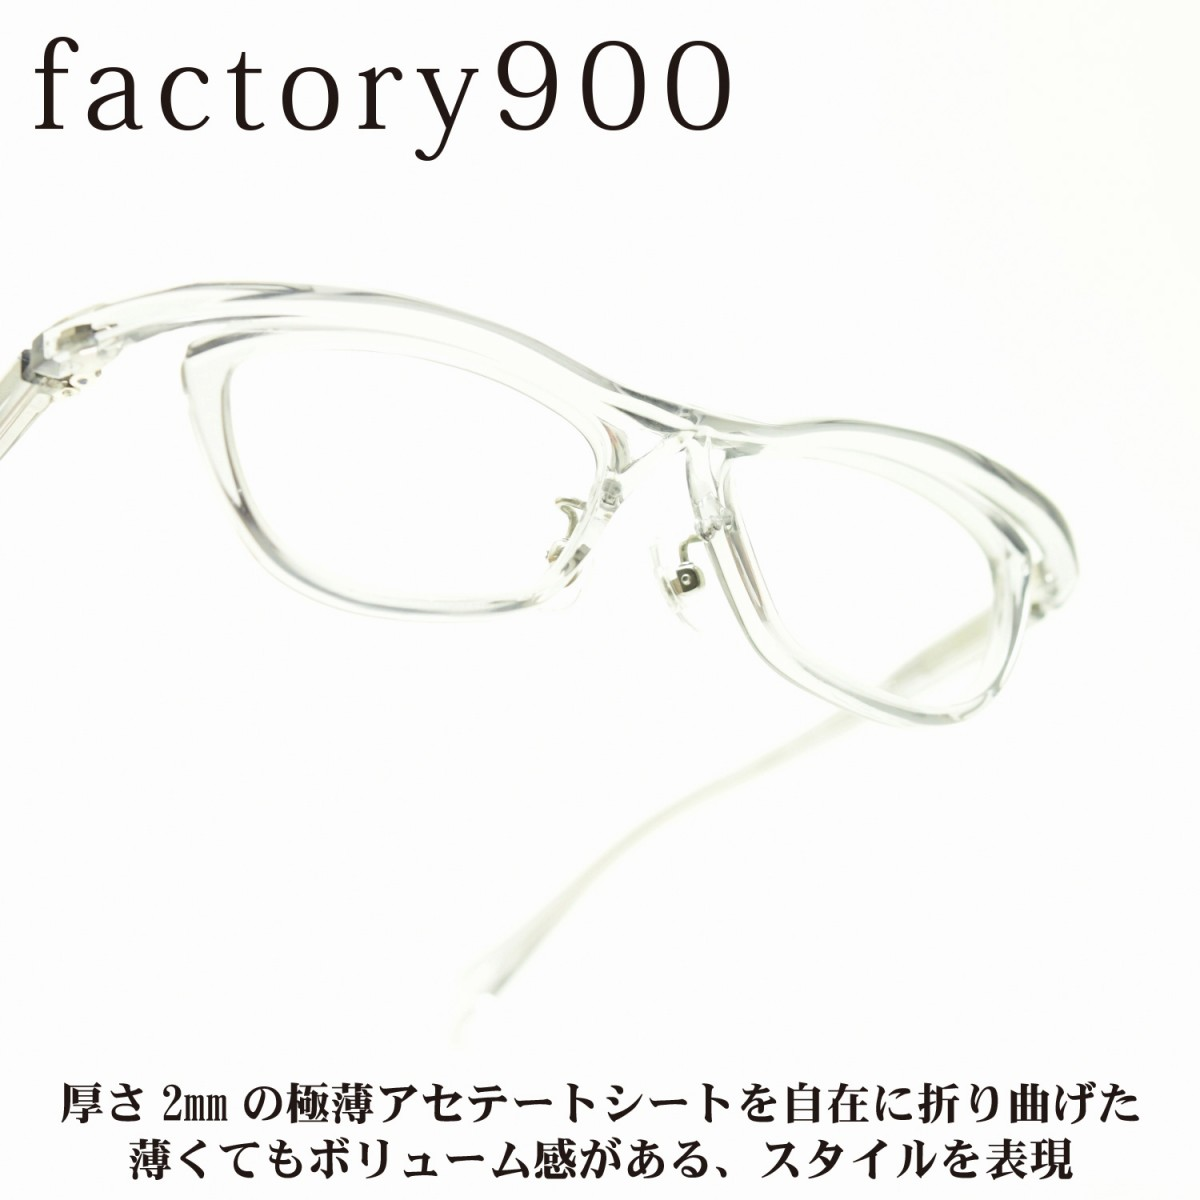 factory900 ファクトリー900FA-2032 col-840